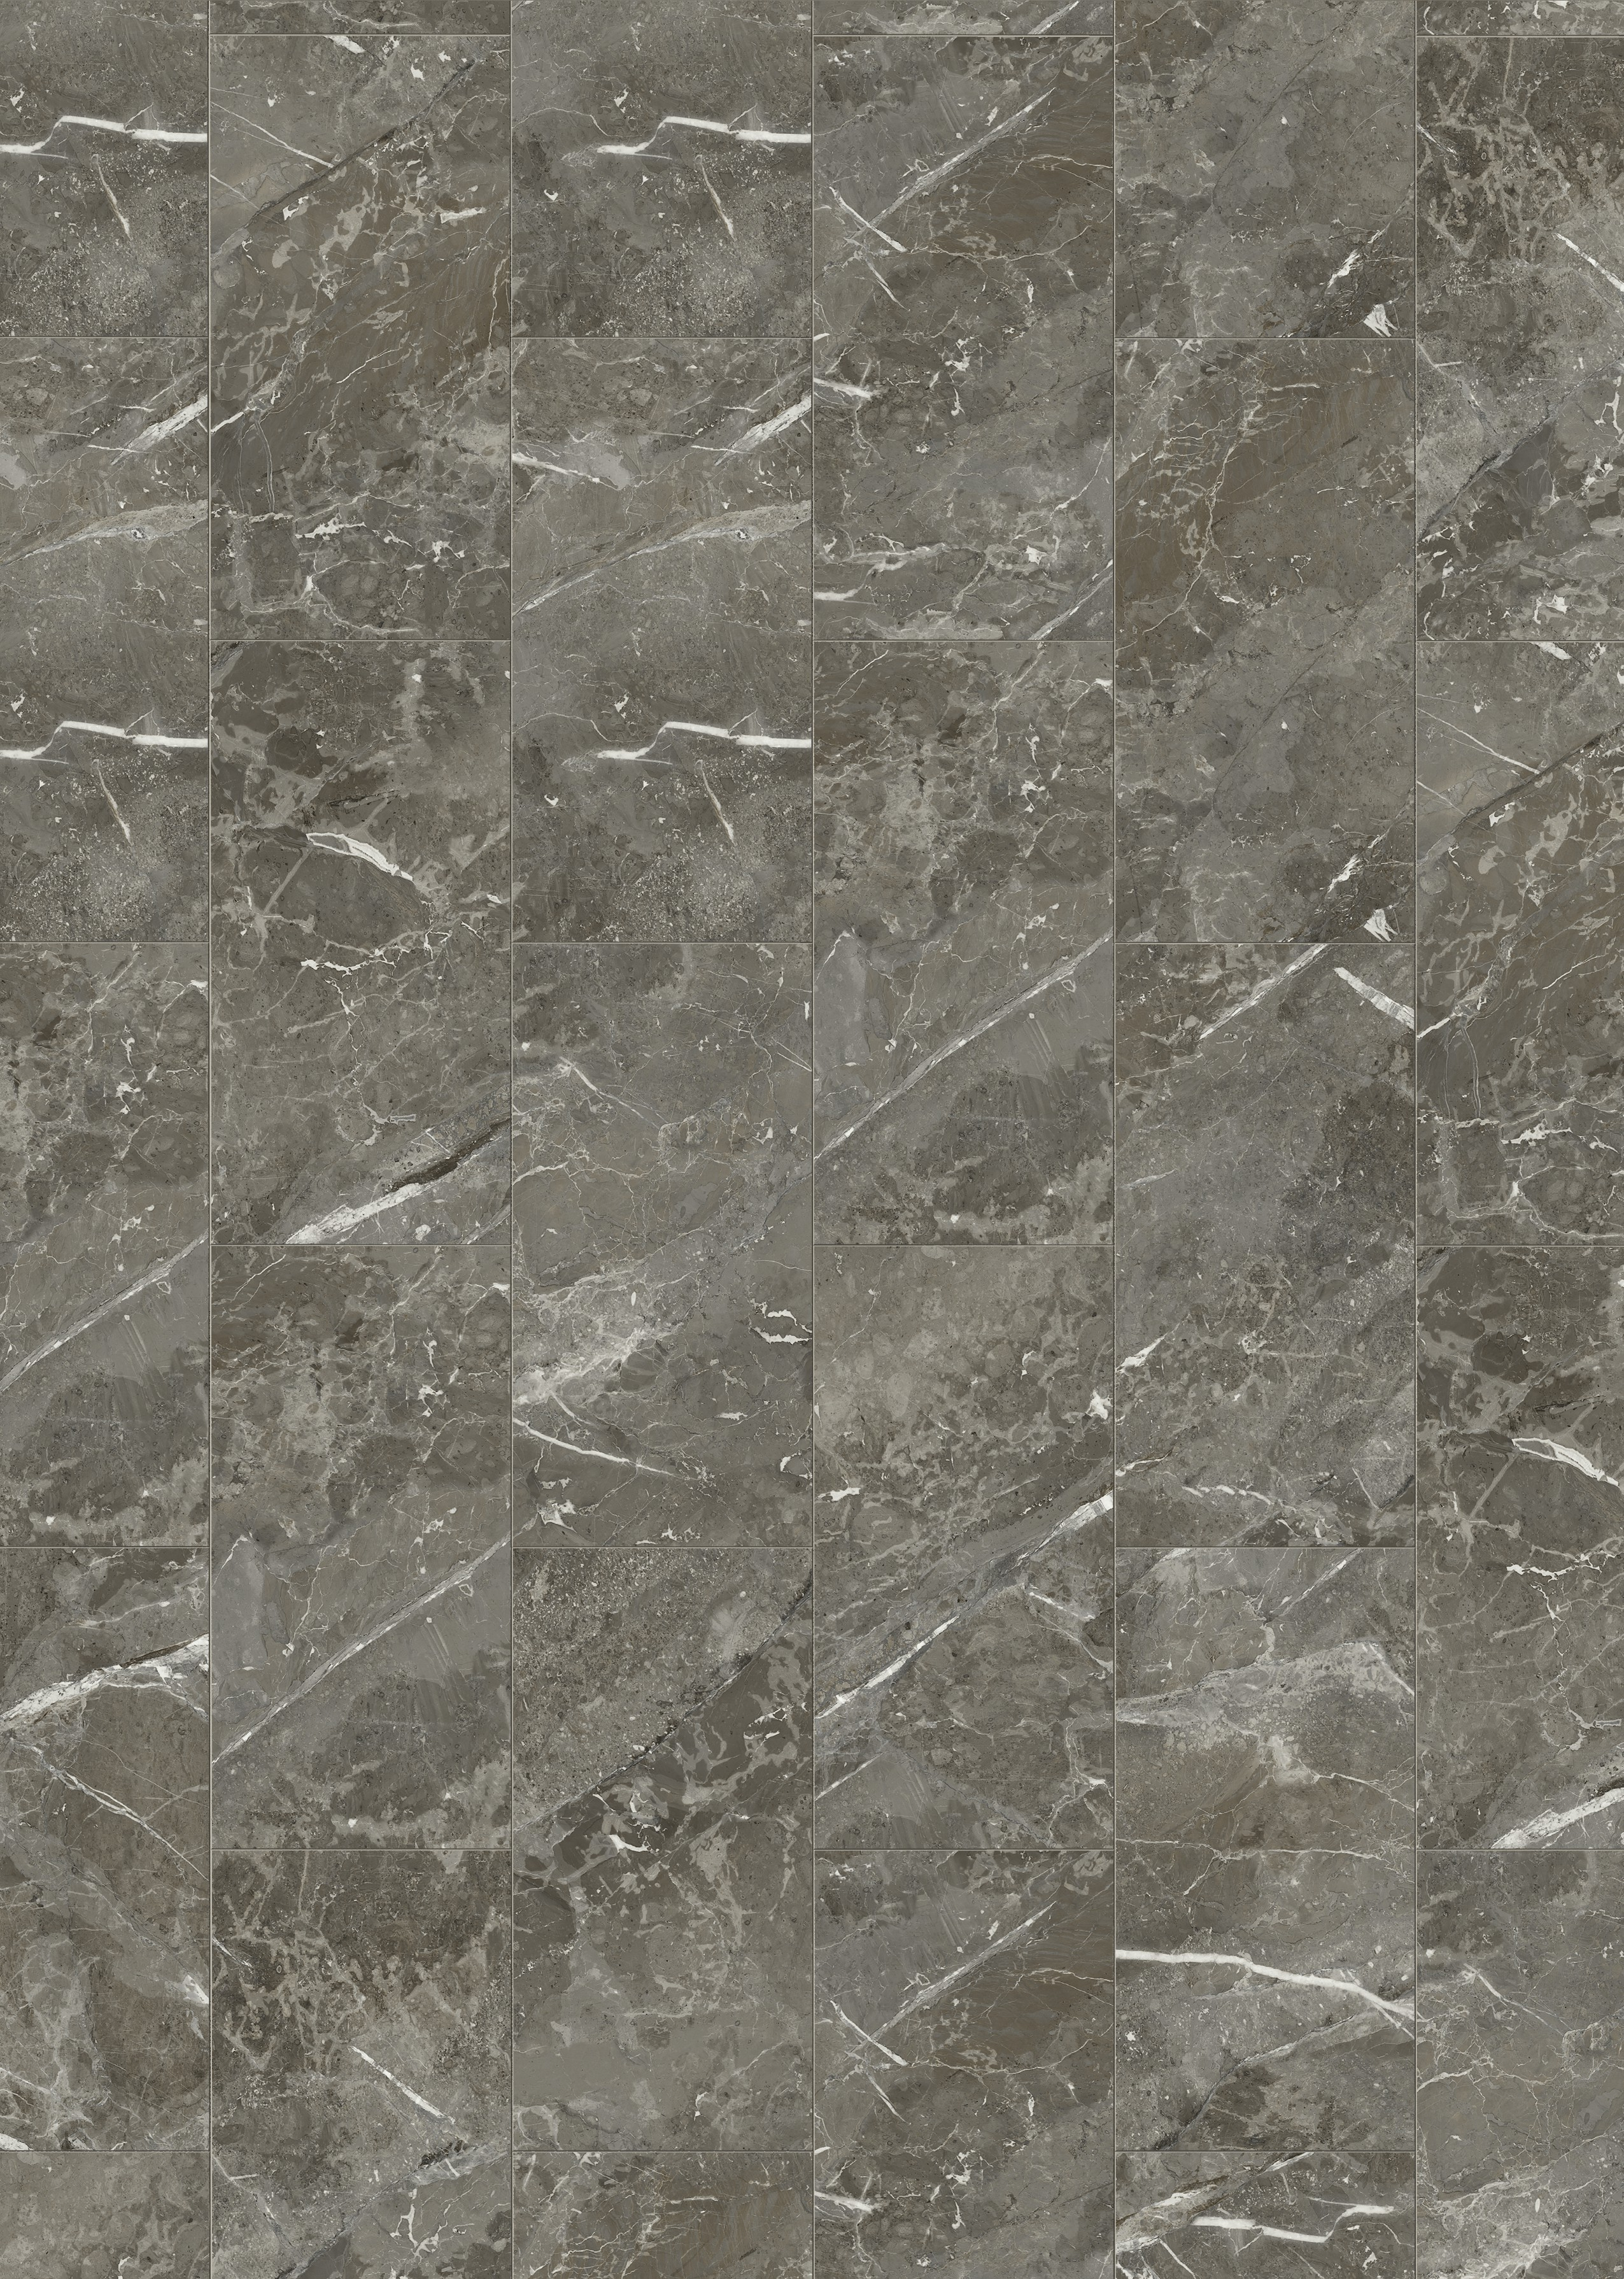 MUSTER VisioGrande Laminat Autentico Fliese Granit dunkel 8 mm